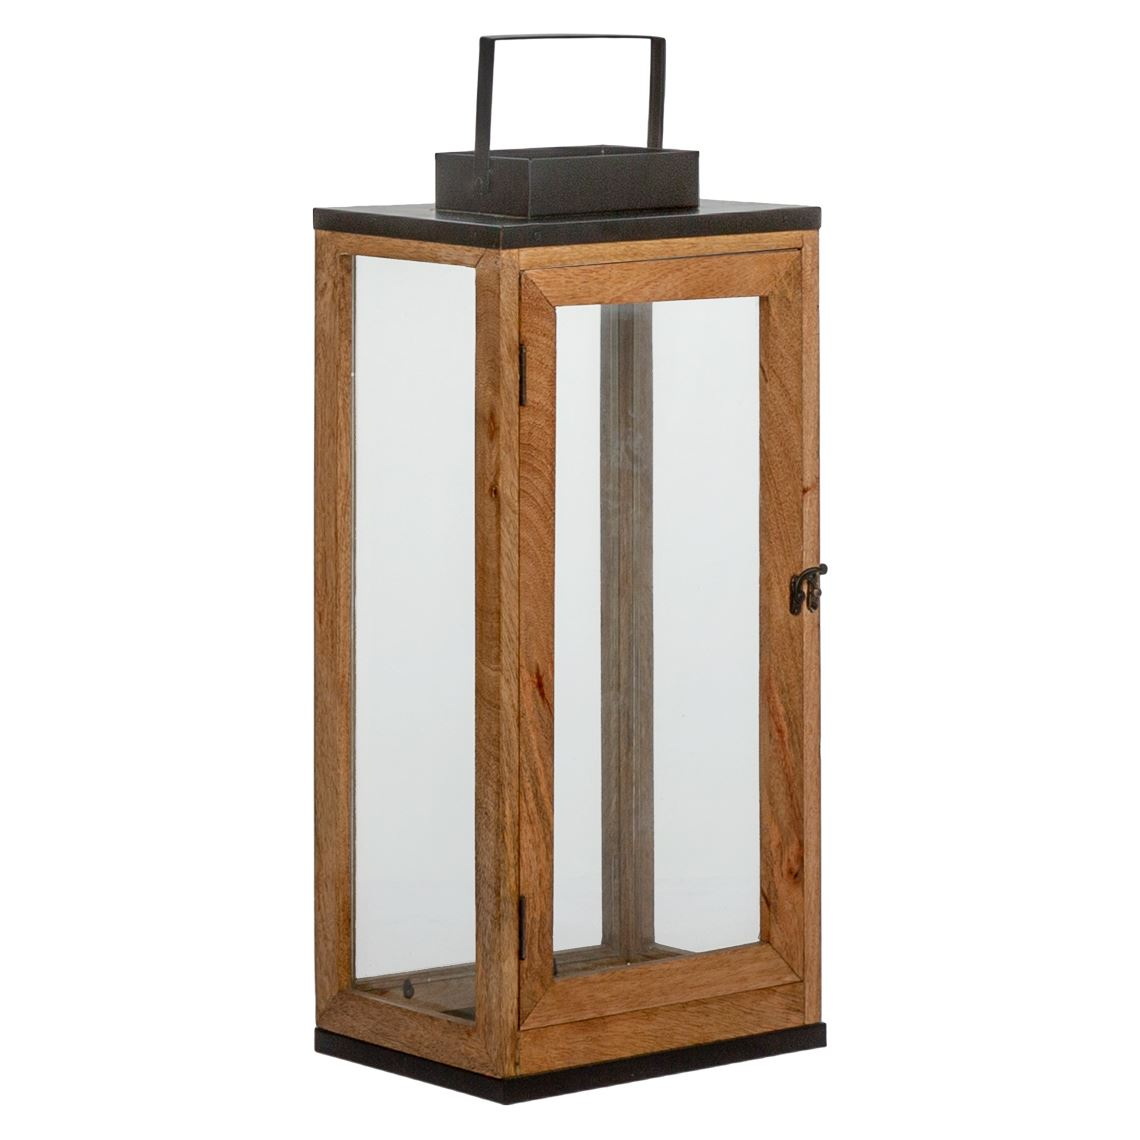 Anafi Lantern Size W 26cm x D 20cm x H 57cm in Black Freedom